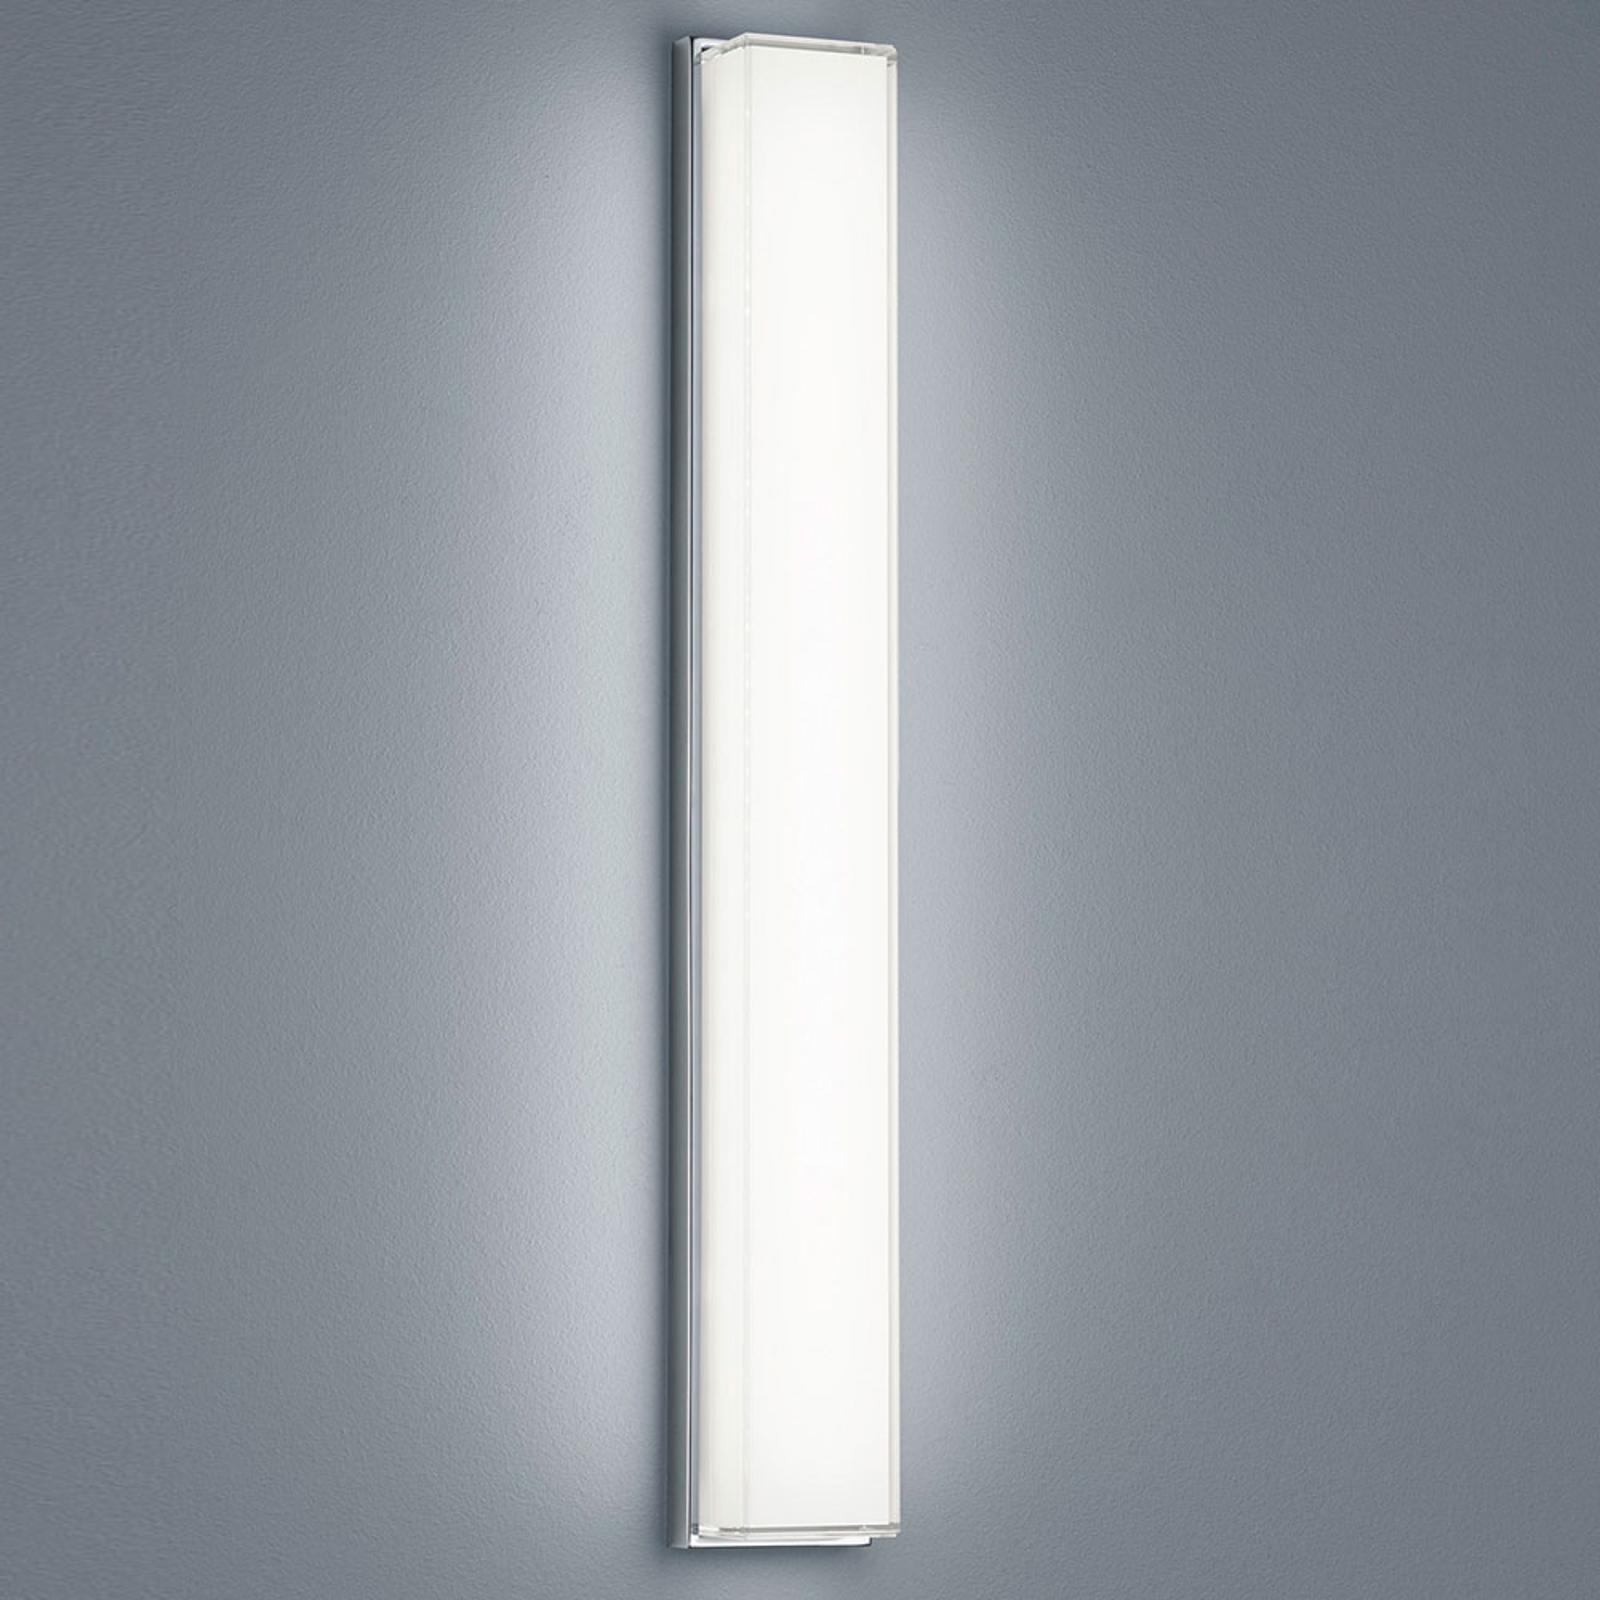 Helestra Cosi LED-Wandleuchte chrom Höhe 61 cm